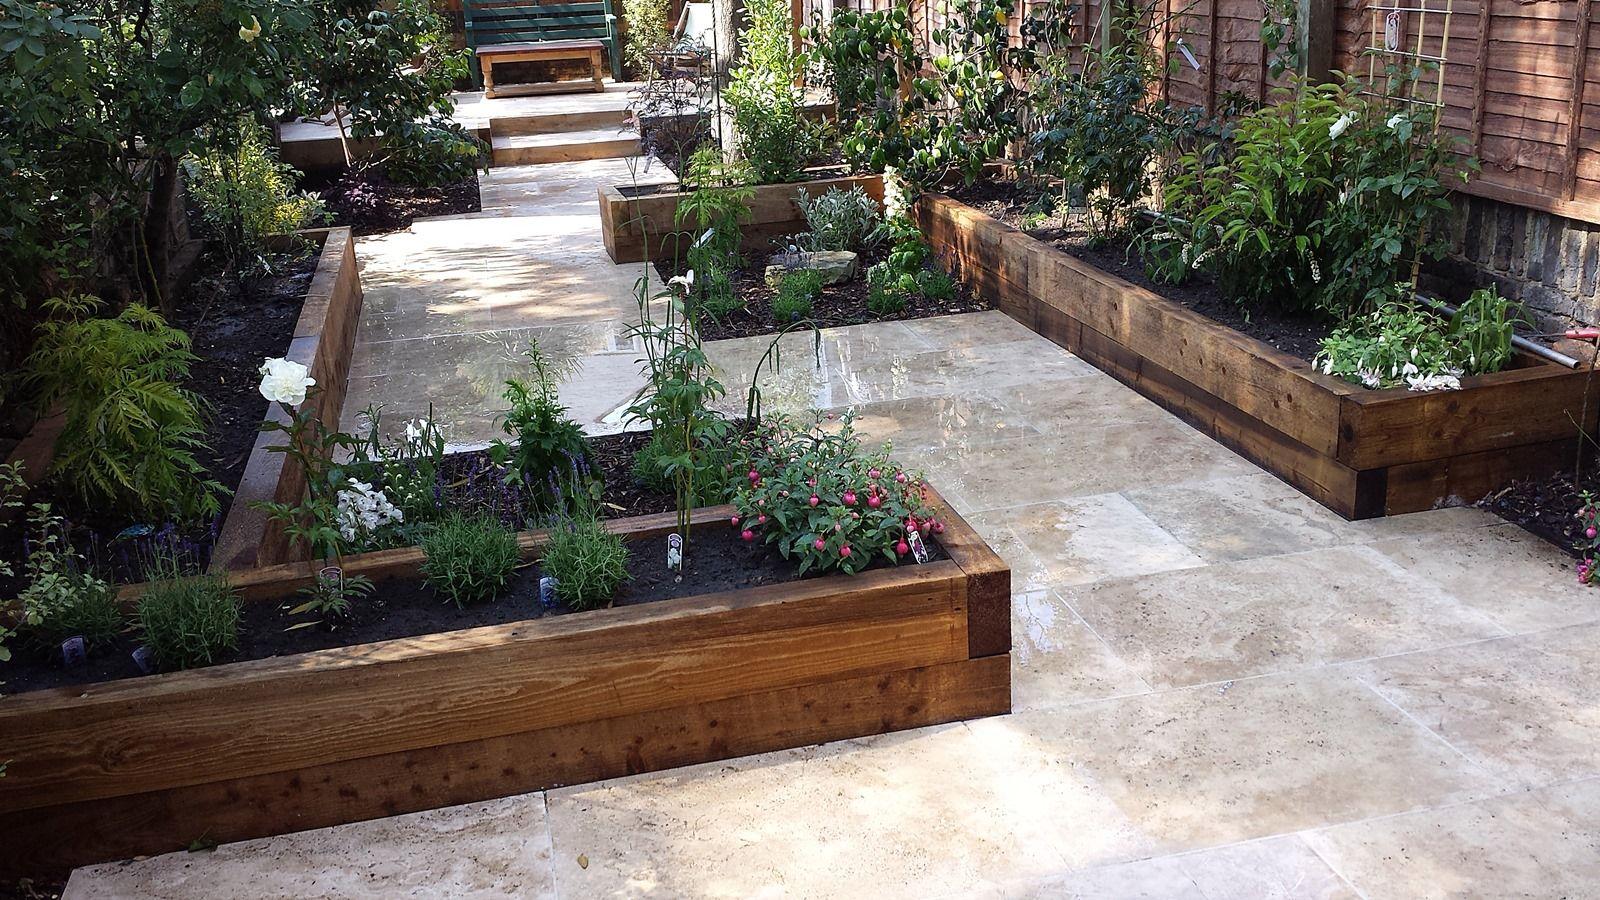 Travertine Paving Patio Garden Wandsworth London Raised Beds Modern  Contemporary Design Low Maintenance (5)